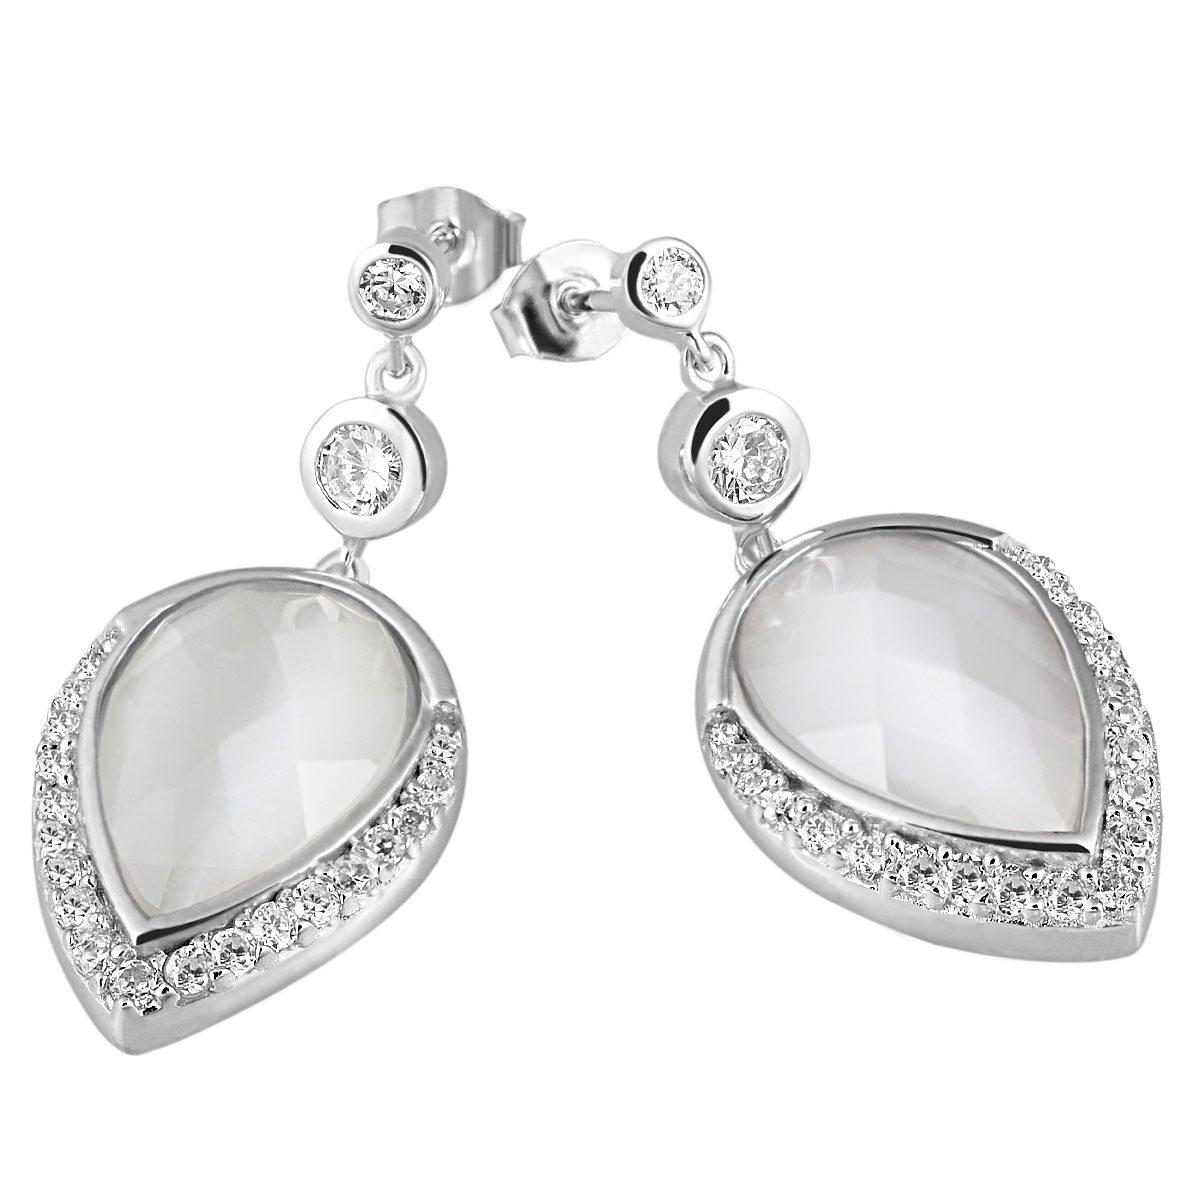 Averdin Paar Ohrhänger Silber 925/- Glassteine Tropfen klare Zirkonia